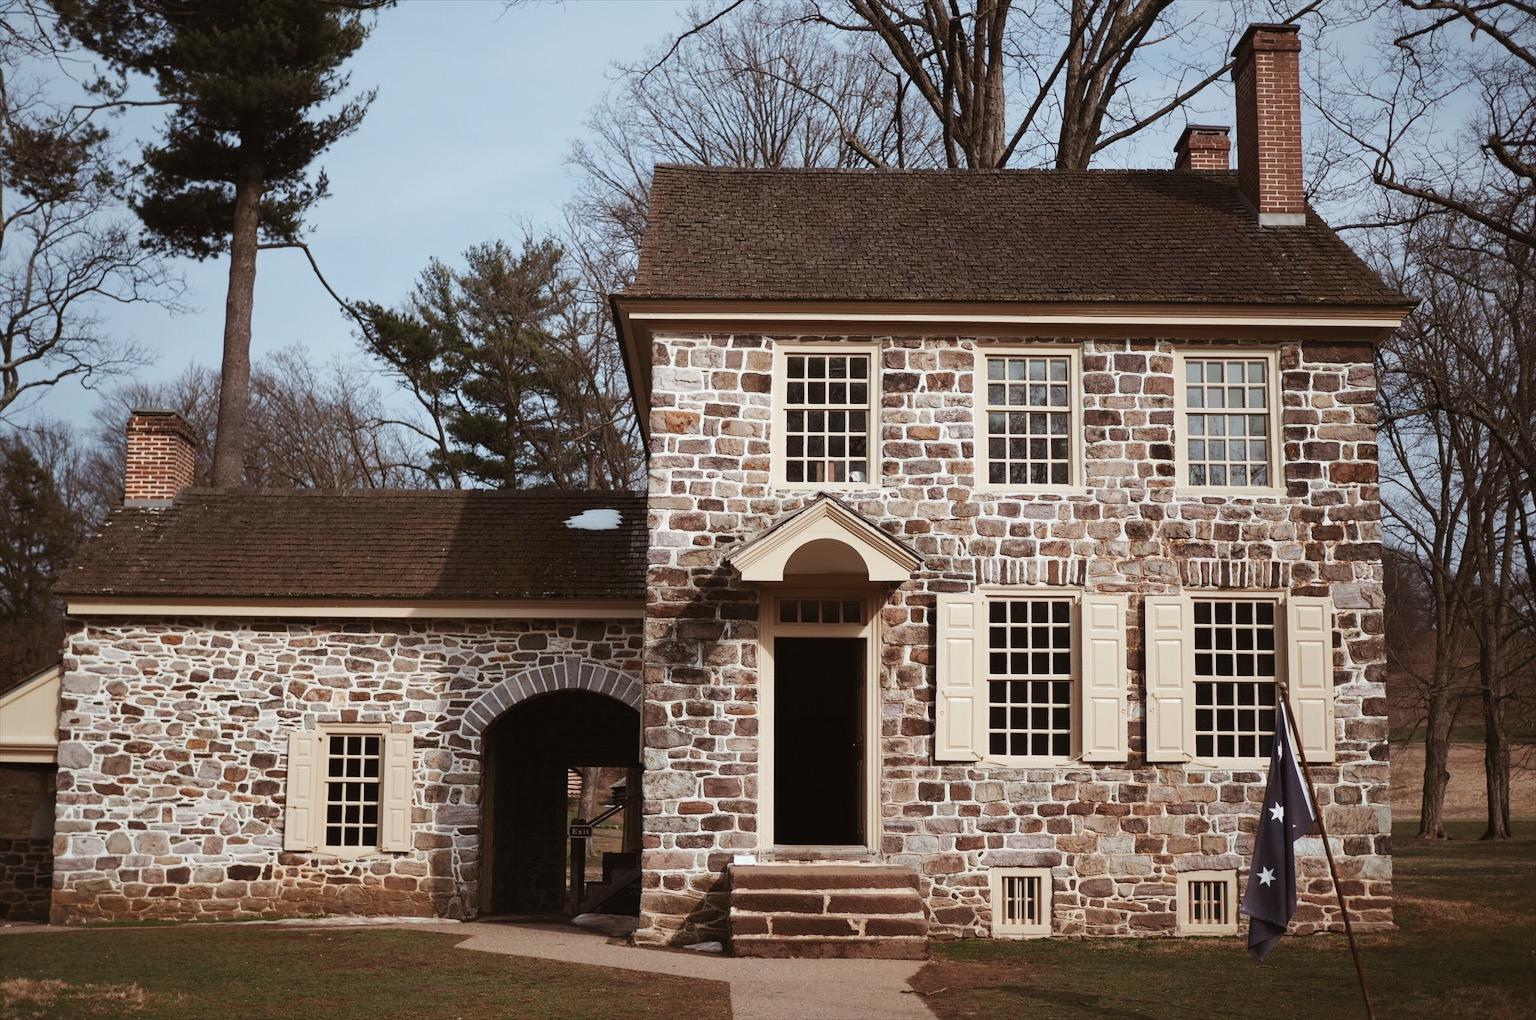 Philadelphie Valley Forge National Historical Park